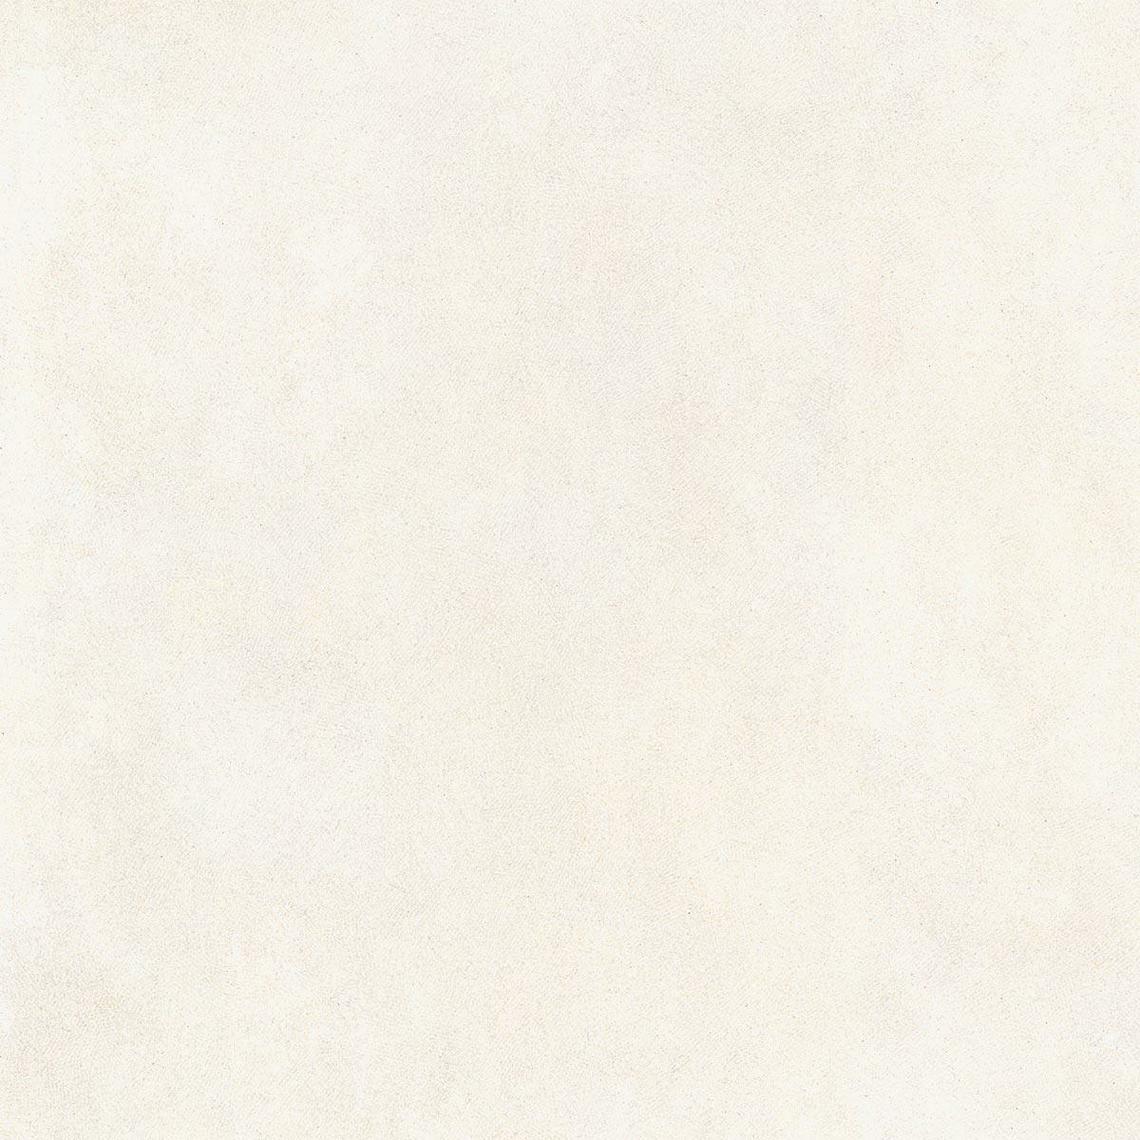 HERMES SAND MATT RECT. (120x120)